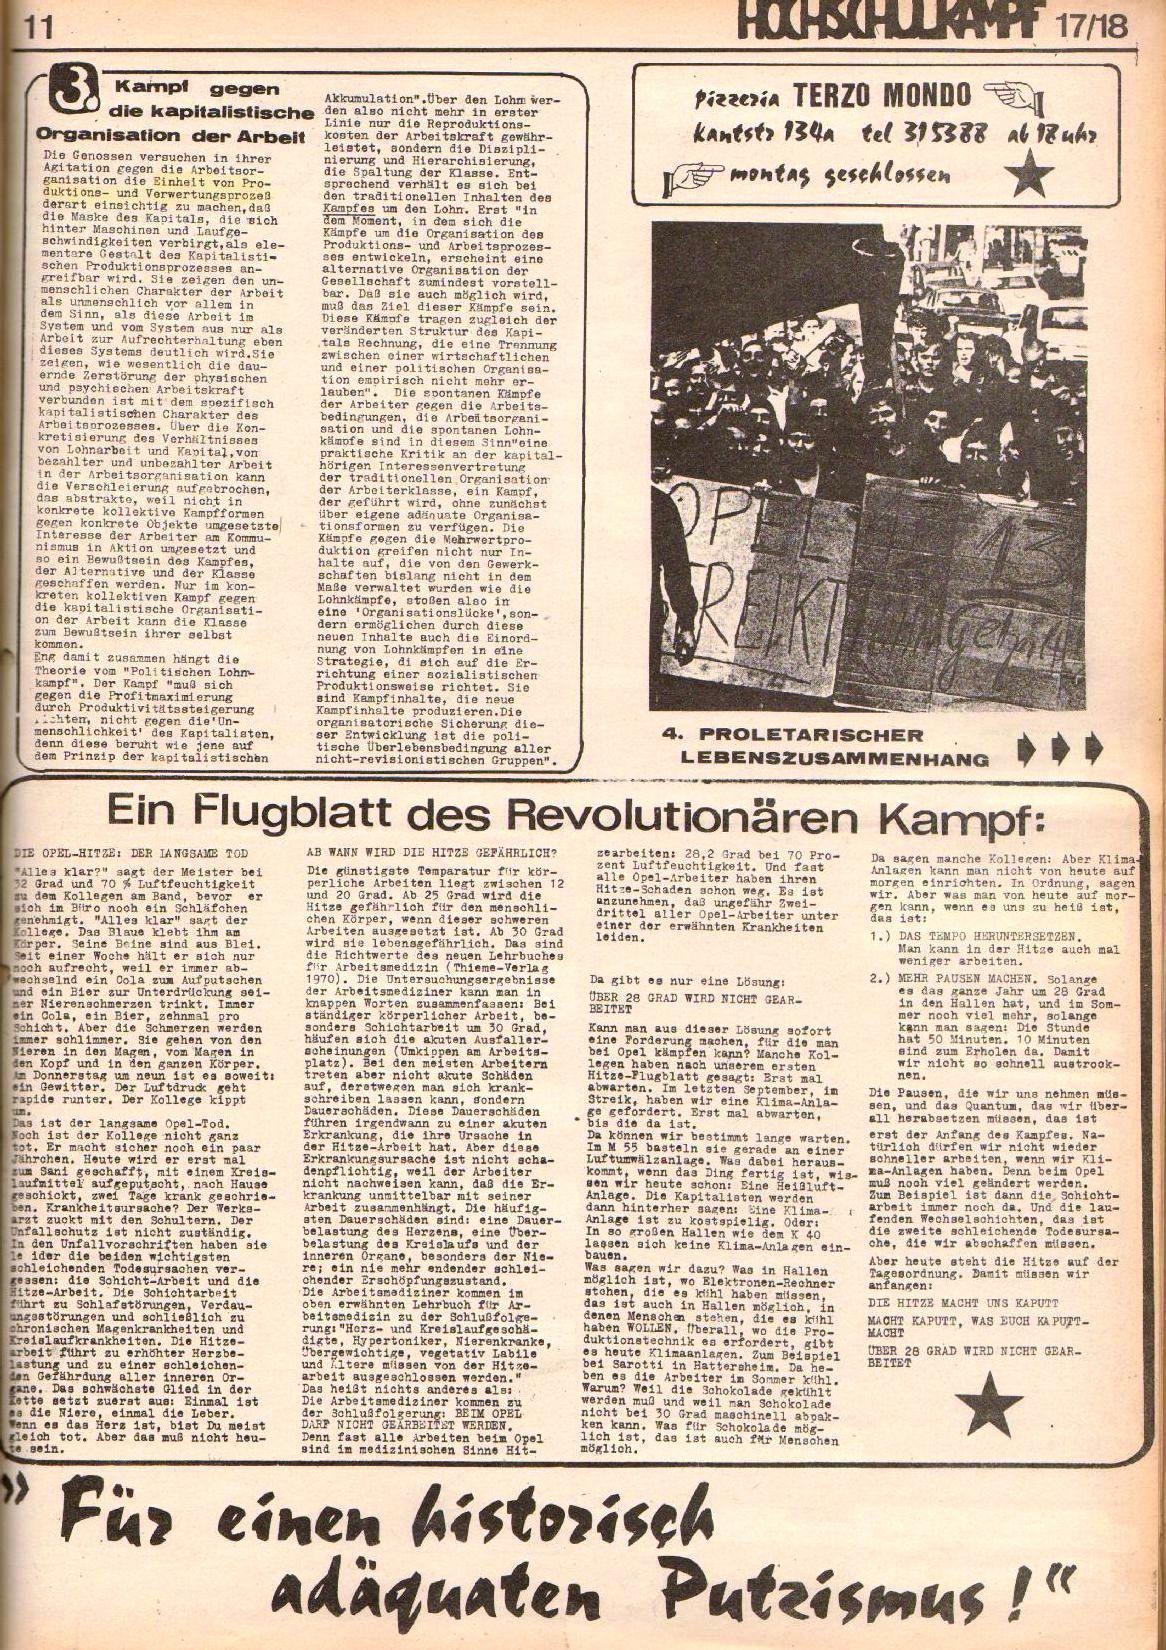 Berlin_Hochschulkampf_1971_17_11